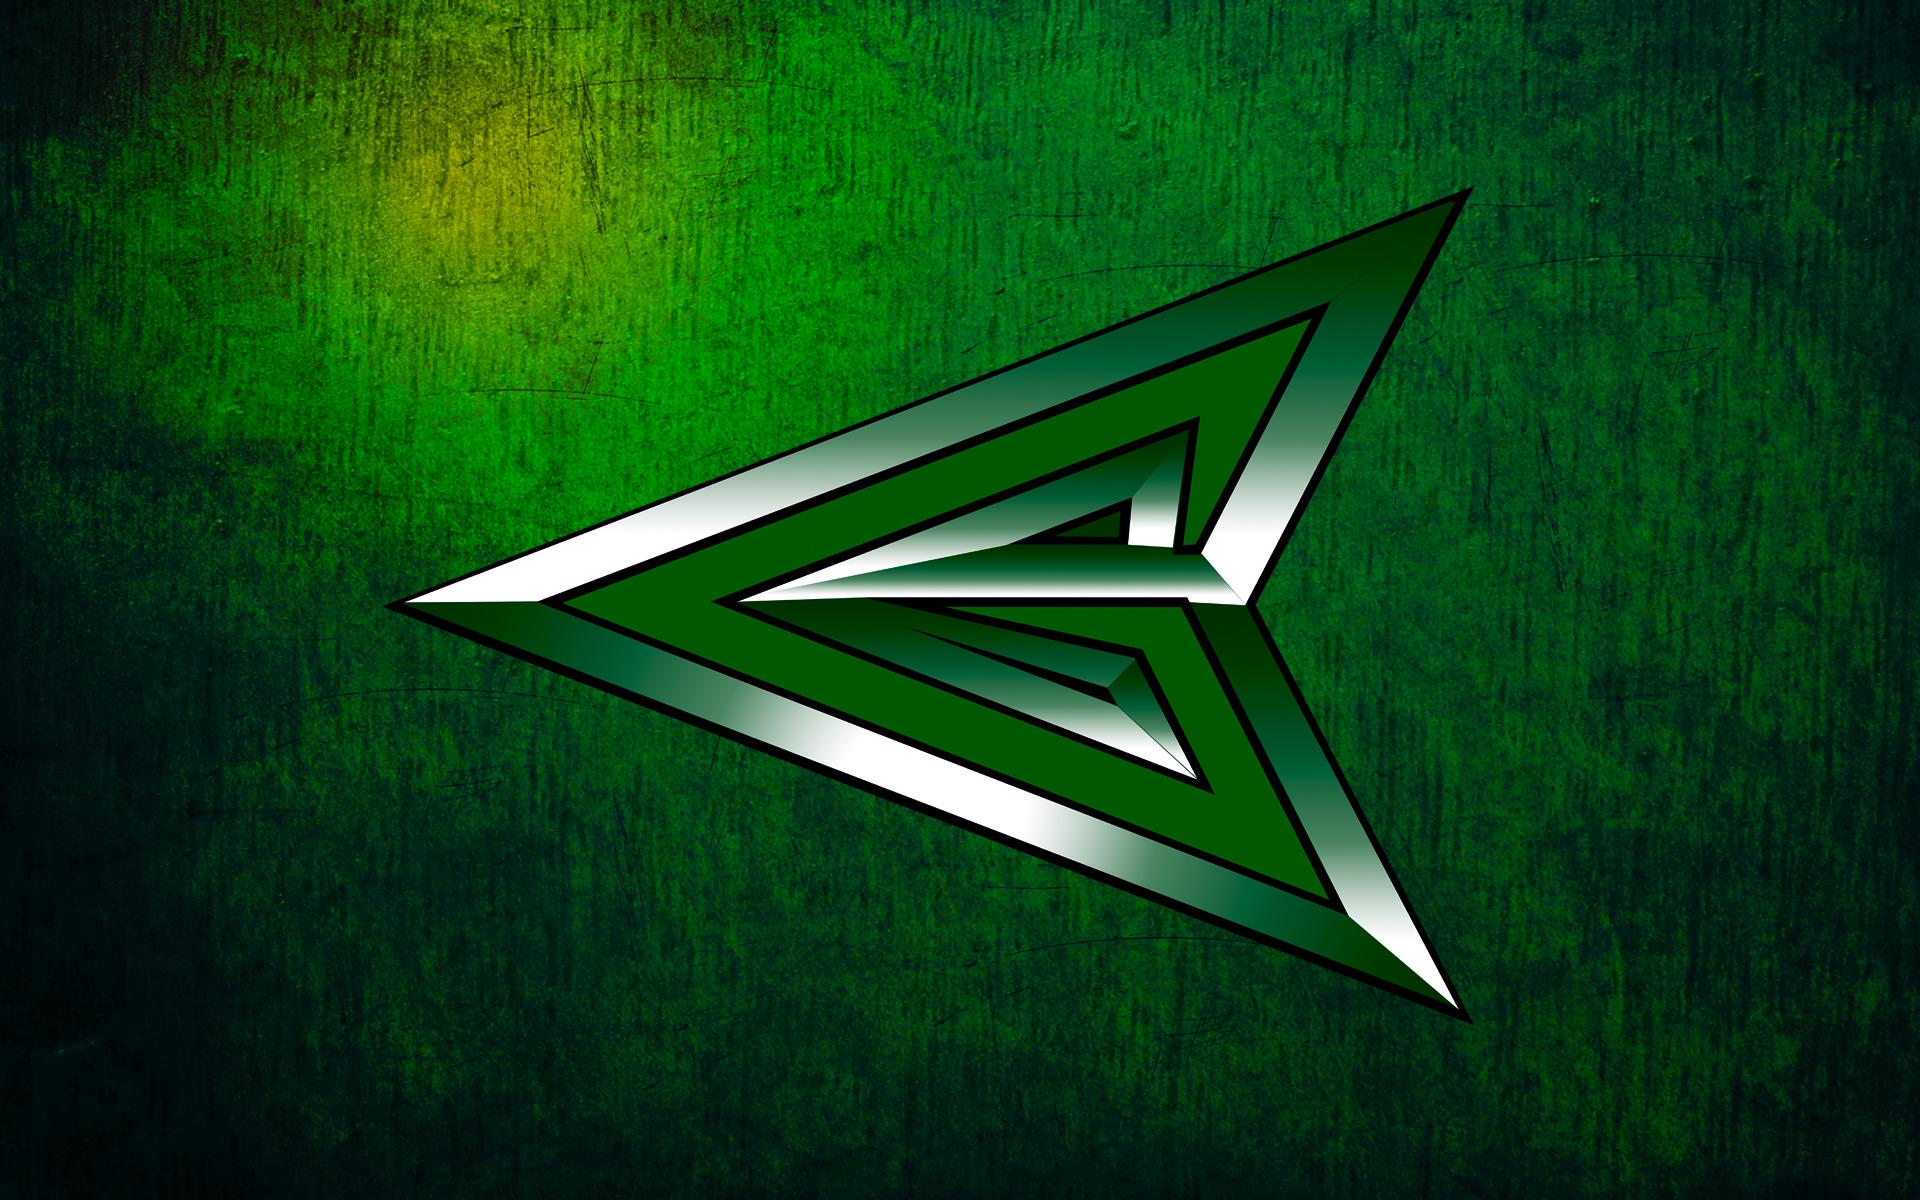 Green Arrow Wallpaper Cw image gallery 1920x1200